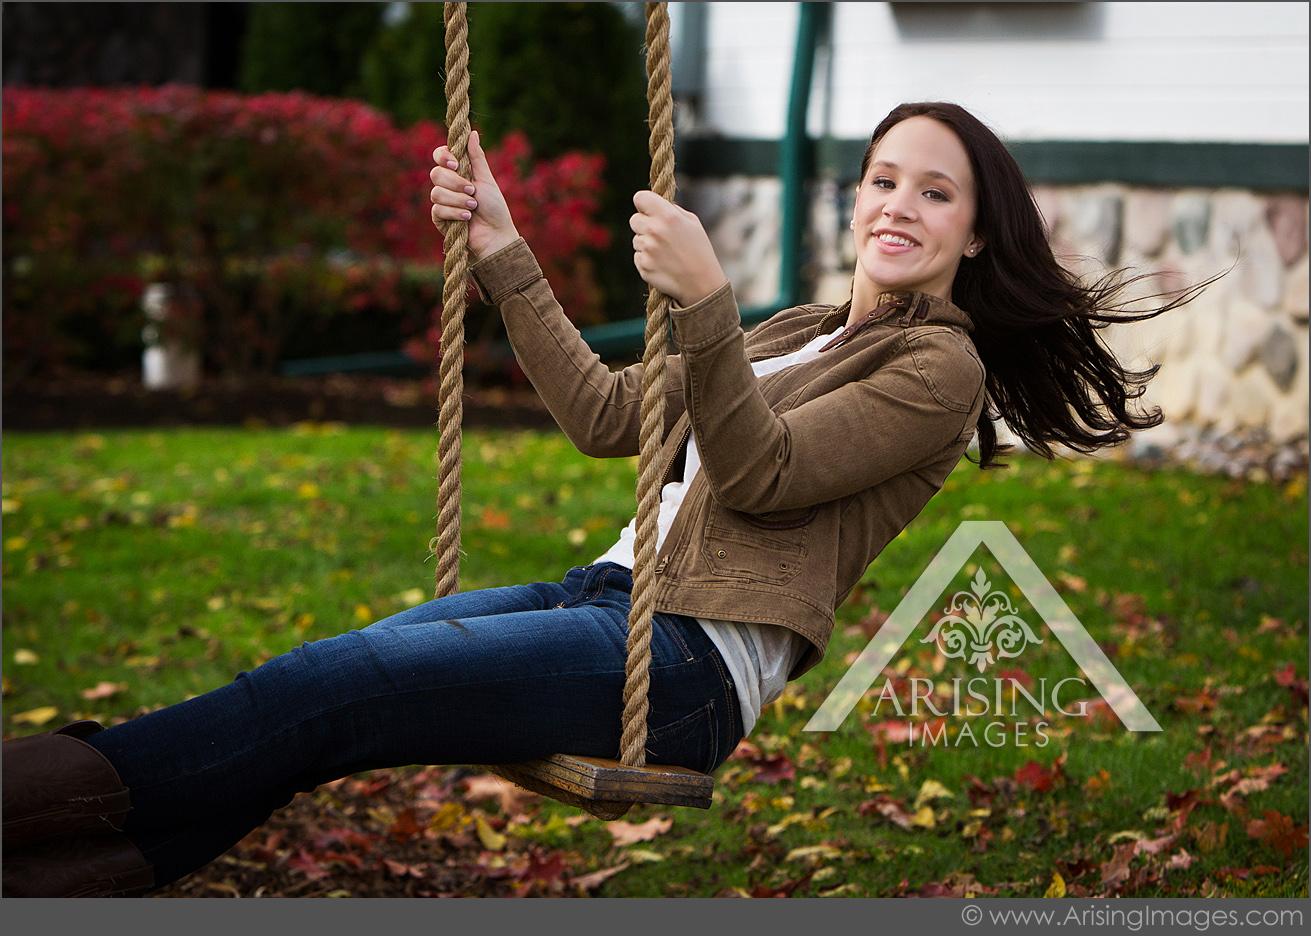 michigan senior pictures girl swinging